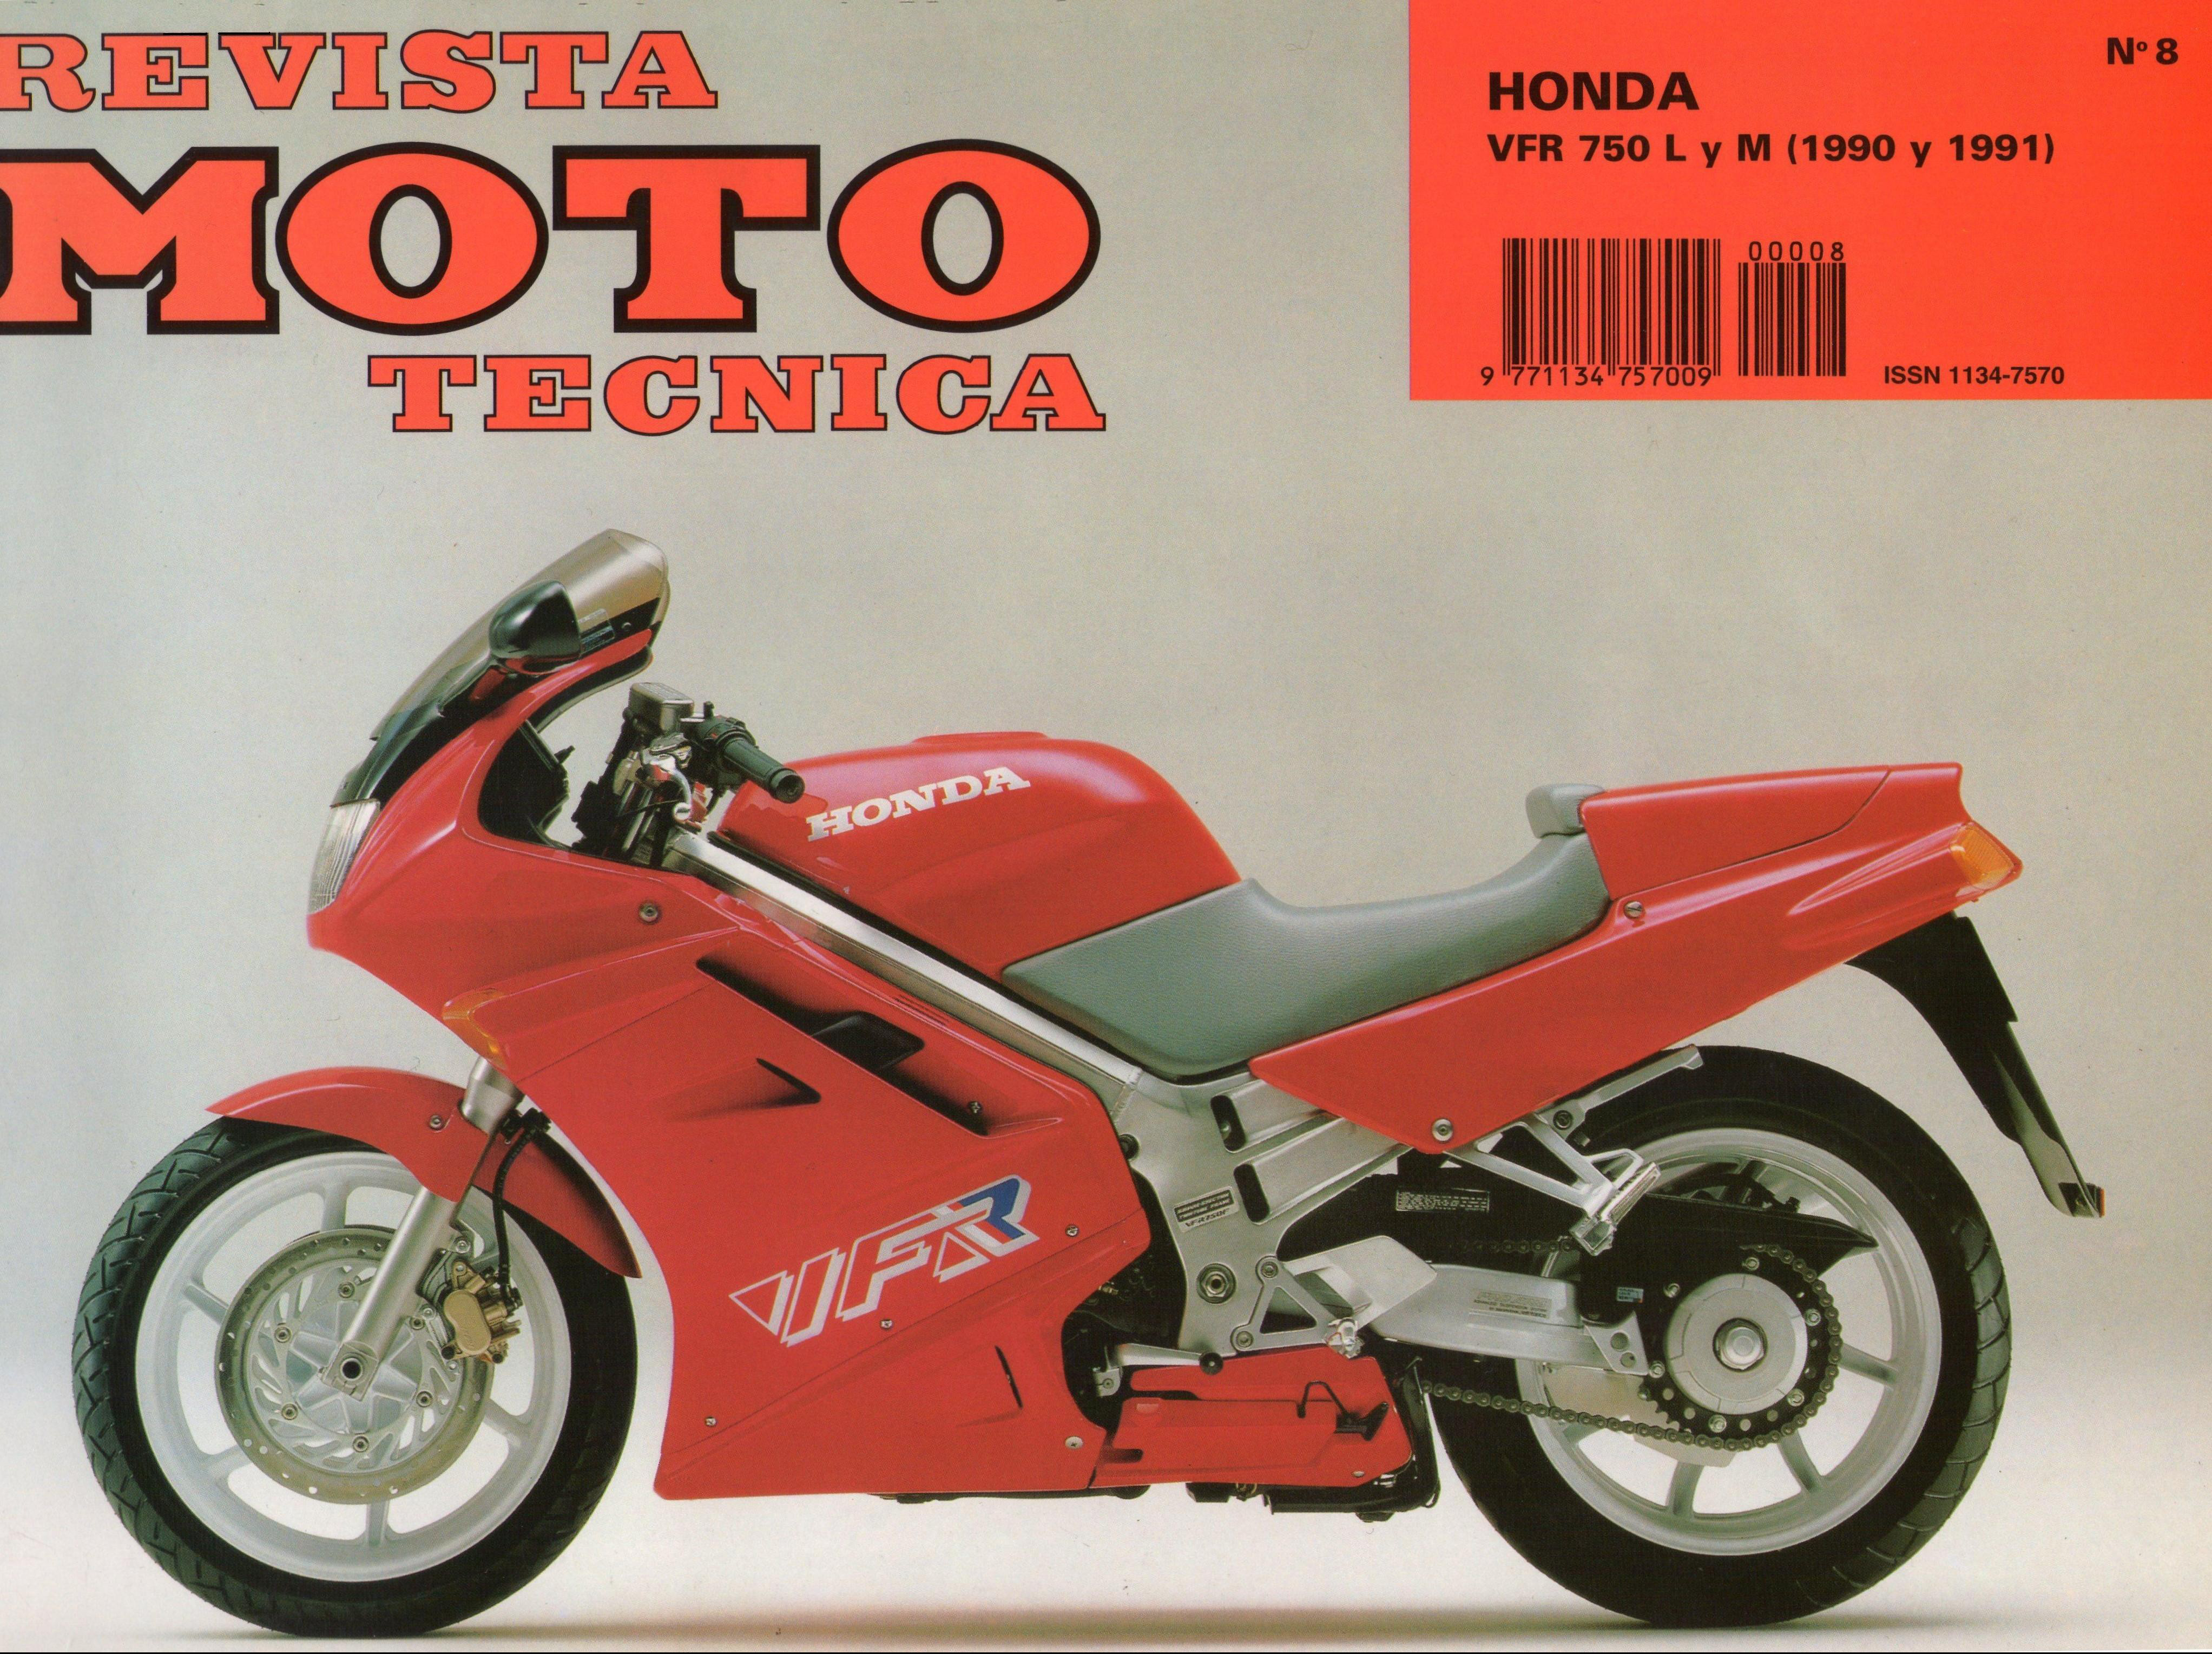 Revista Moto Technica for Honda VFR750M (1991) (Spanish)